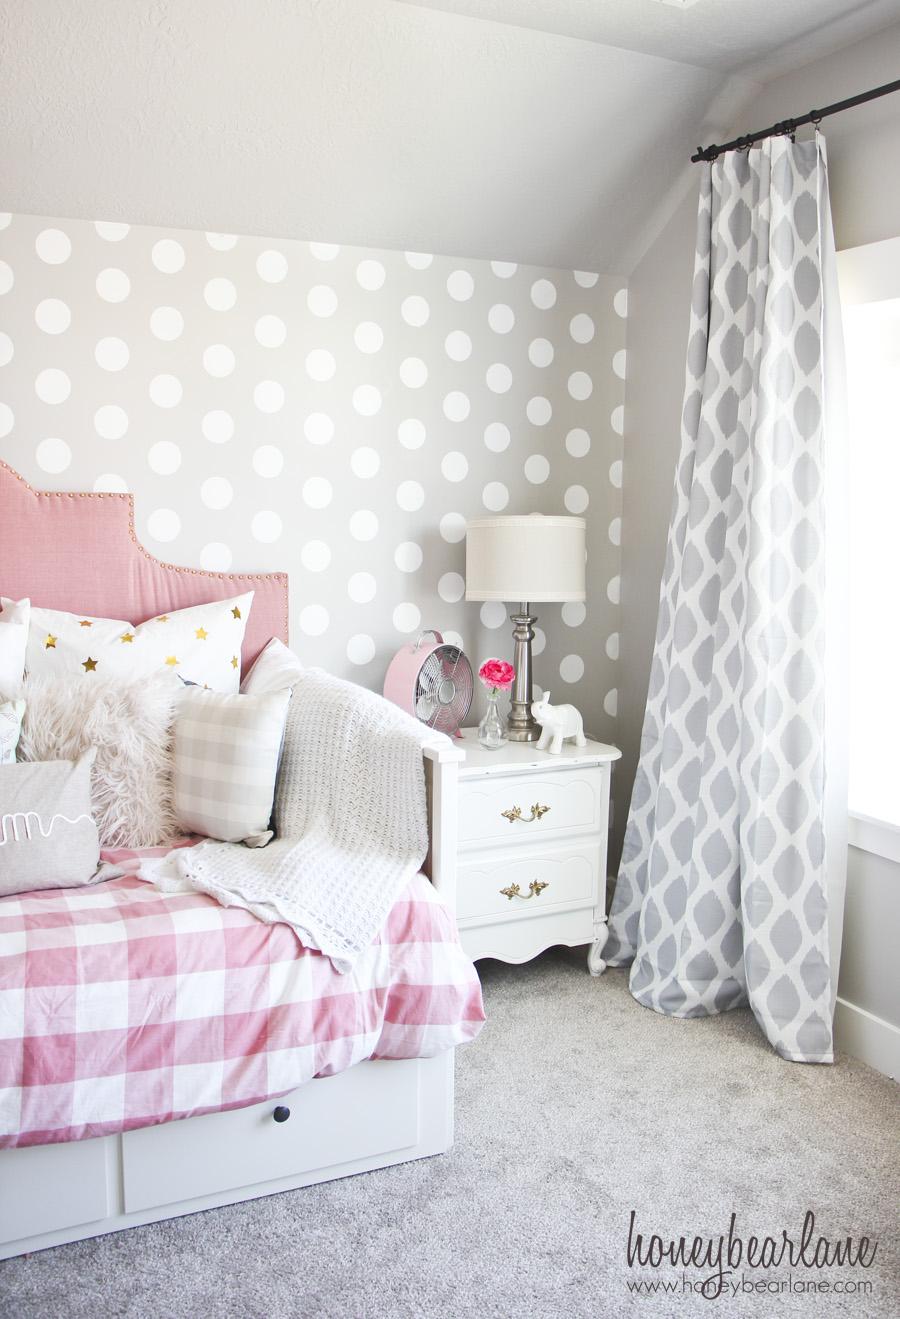 Teenage Girl Room White And Gold Polka Dot Wallpaper Pink And Gray Girl S Bedroom Honeybear Lane